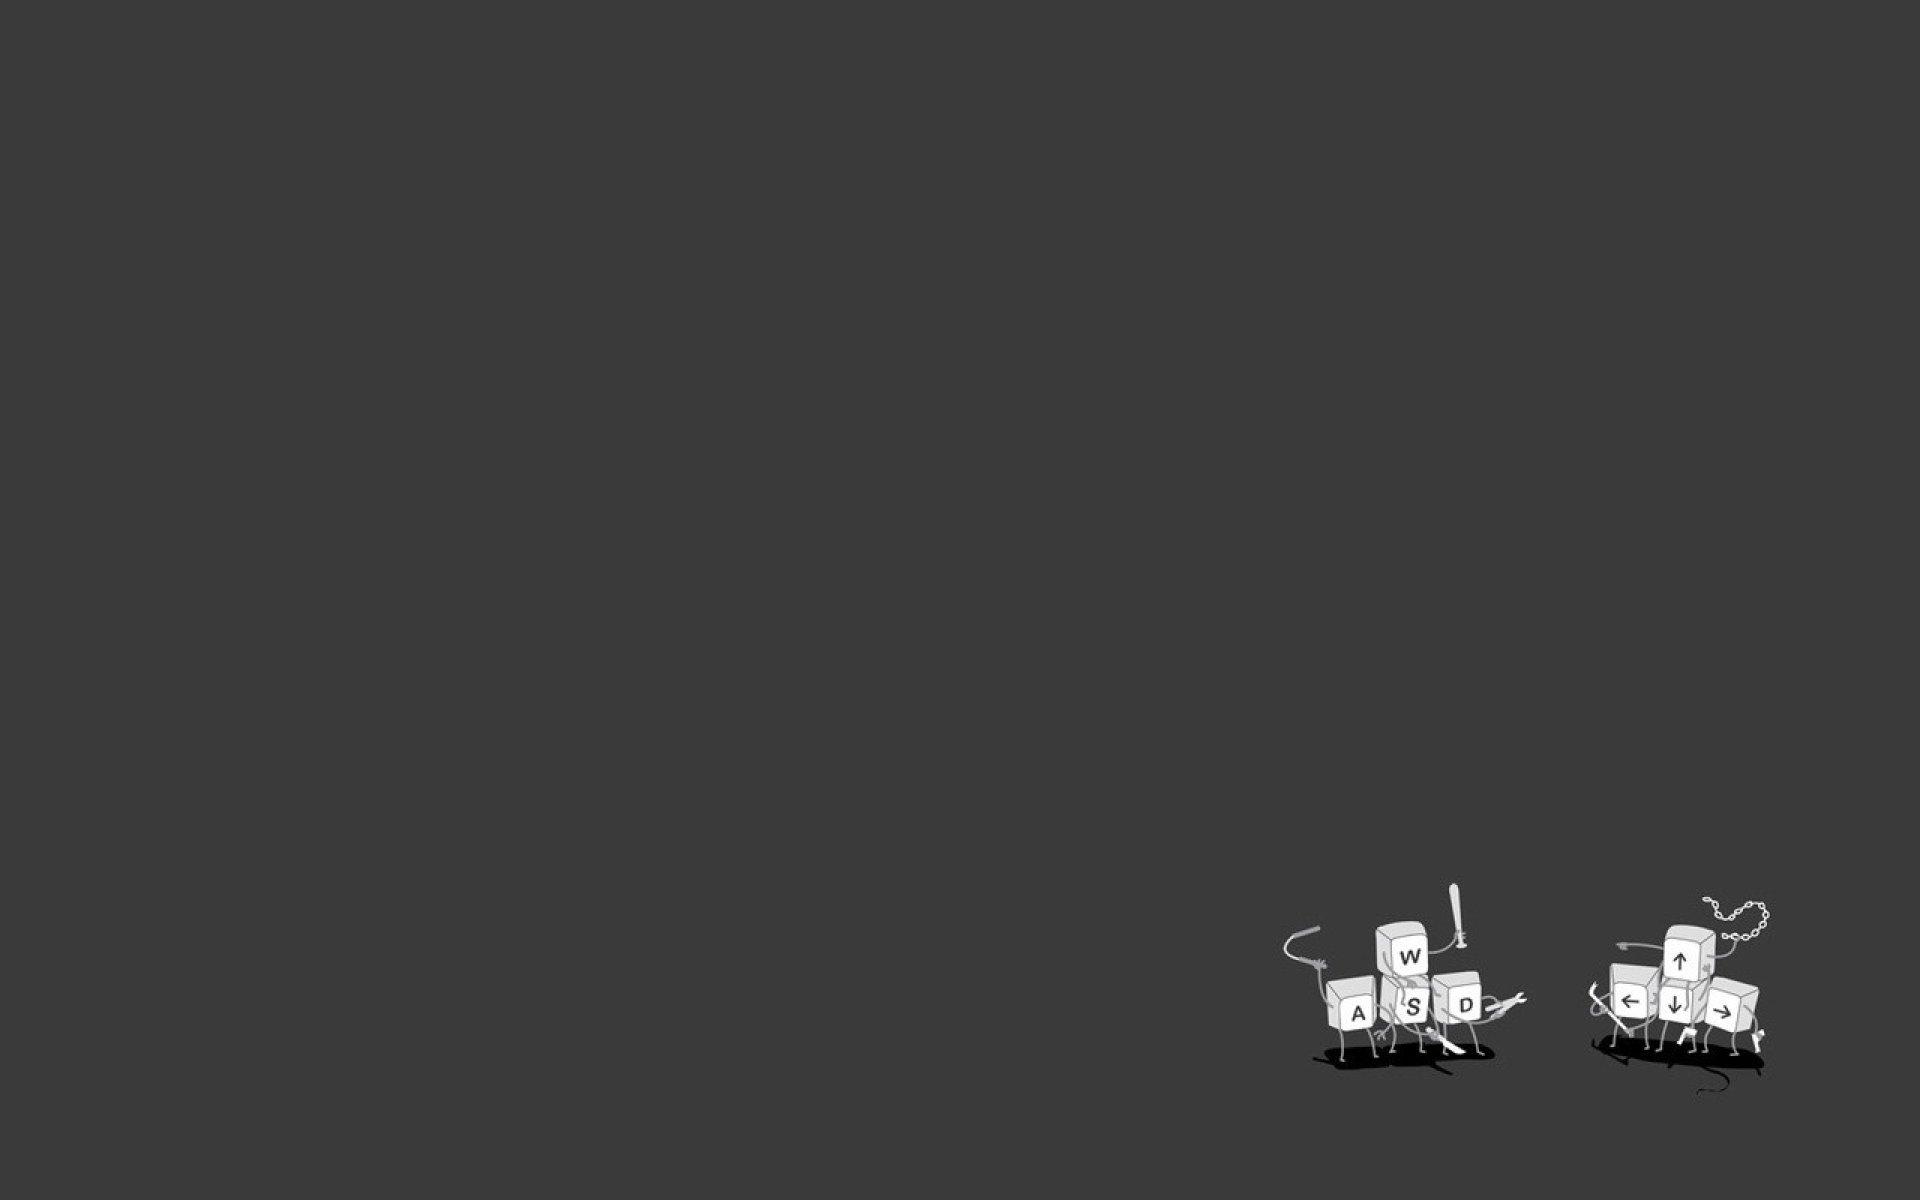 Minimalist HD Wallpaper | Background Image | 2560x1600 ...